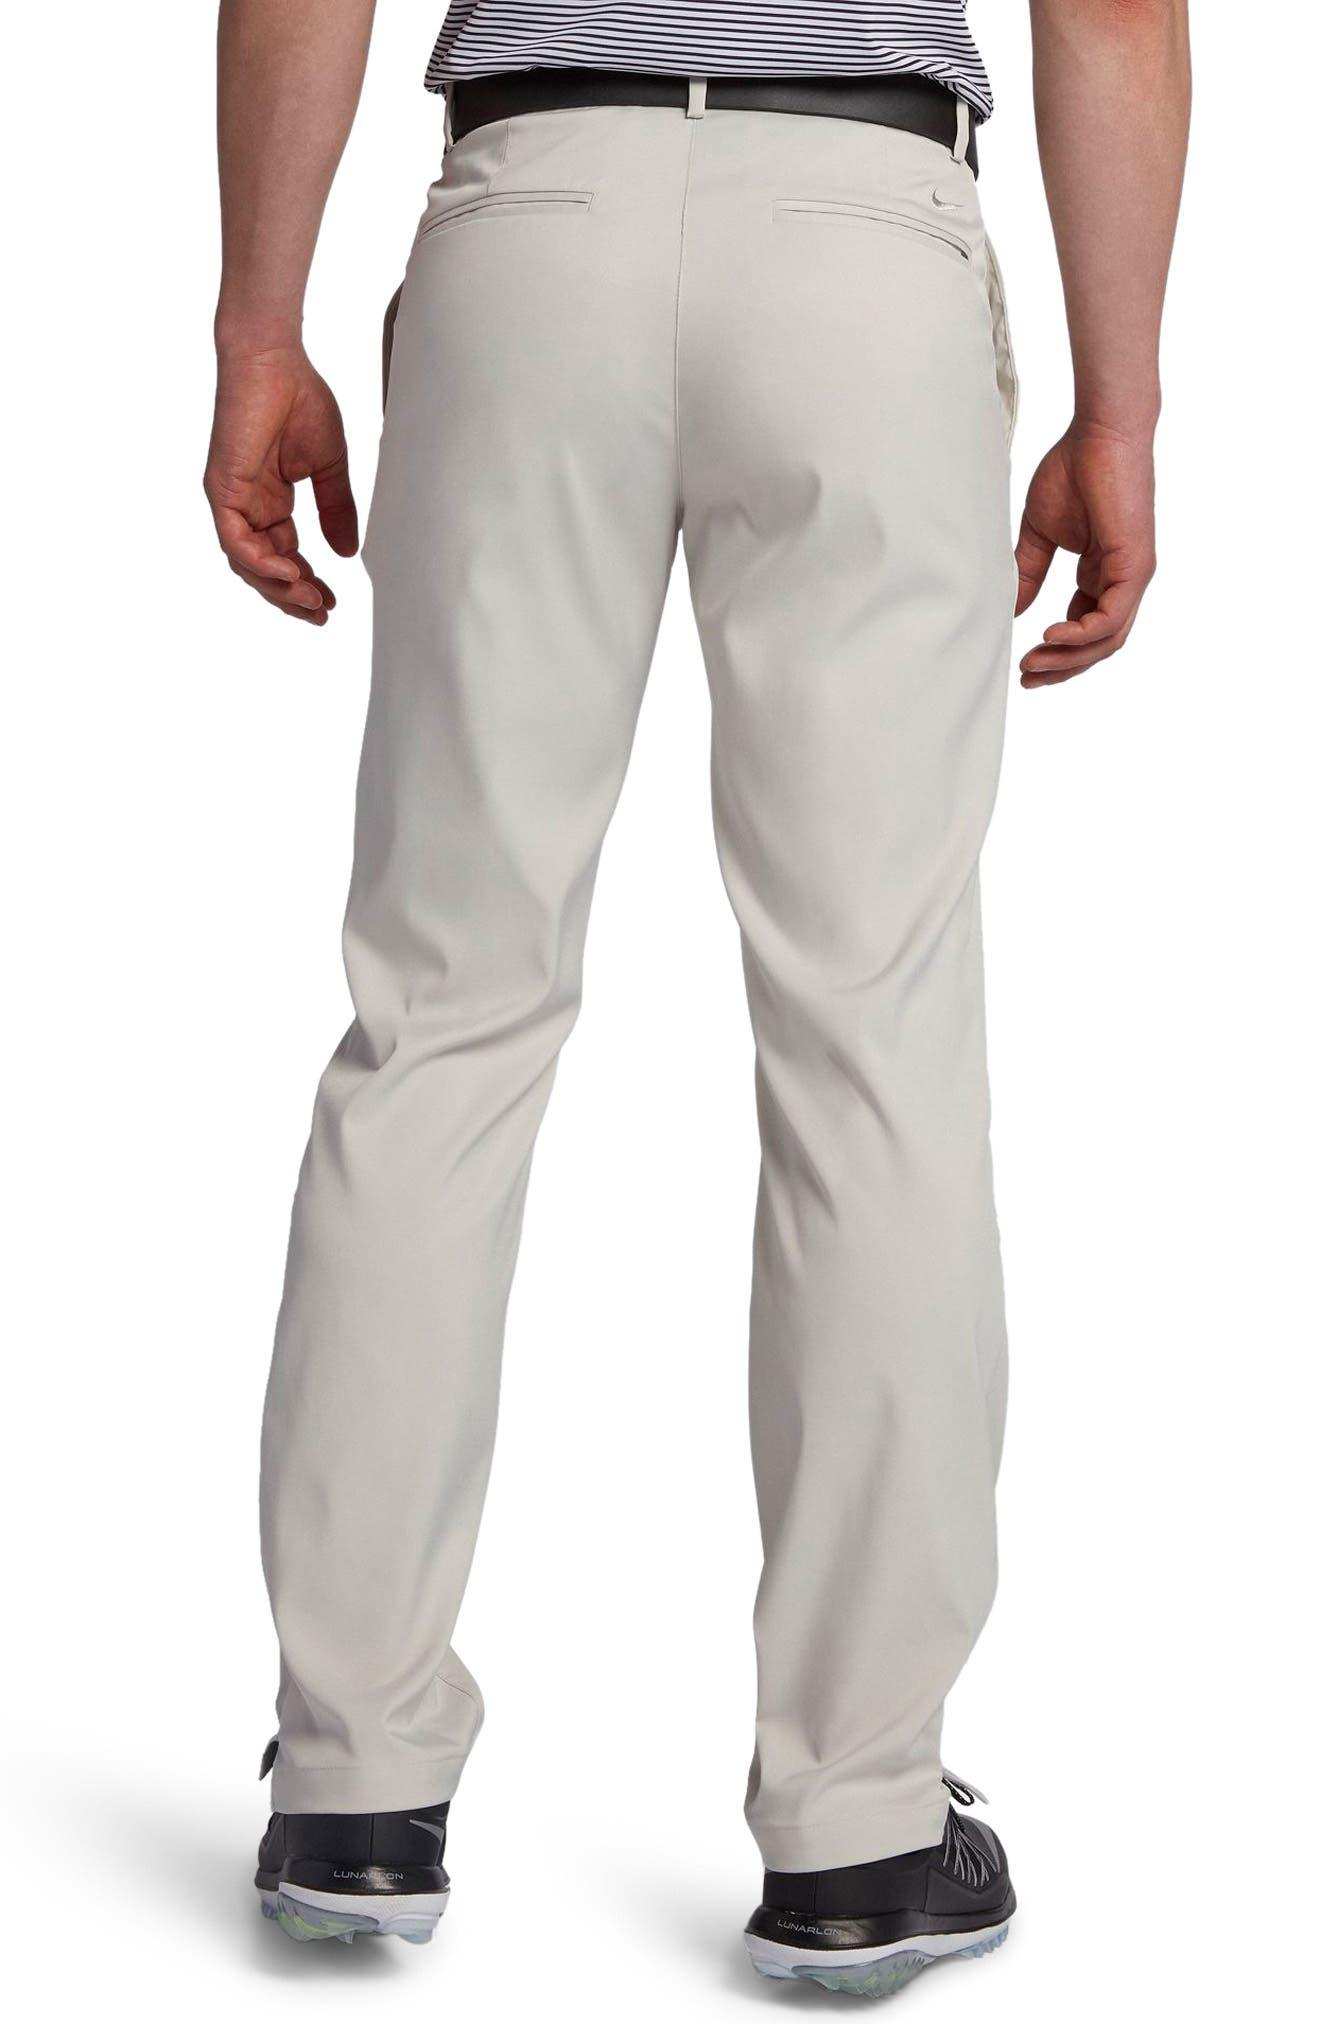 Flat Front Dri-FIT Tech Golf Pants,                             Alternate thumbnail 2, color,                             LIGHT BONE/ LIGHT BONE